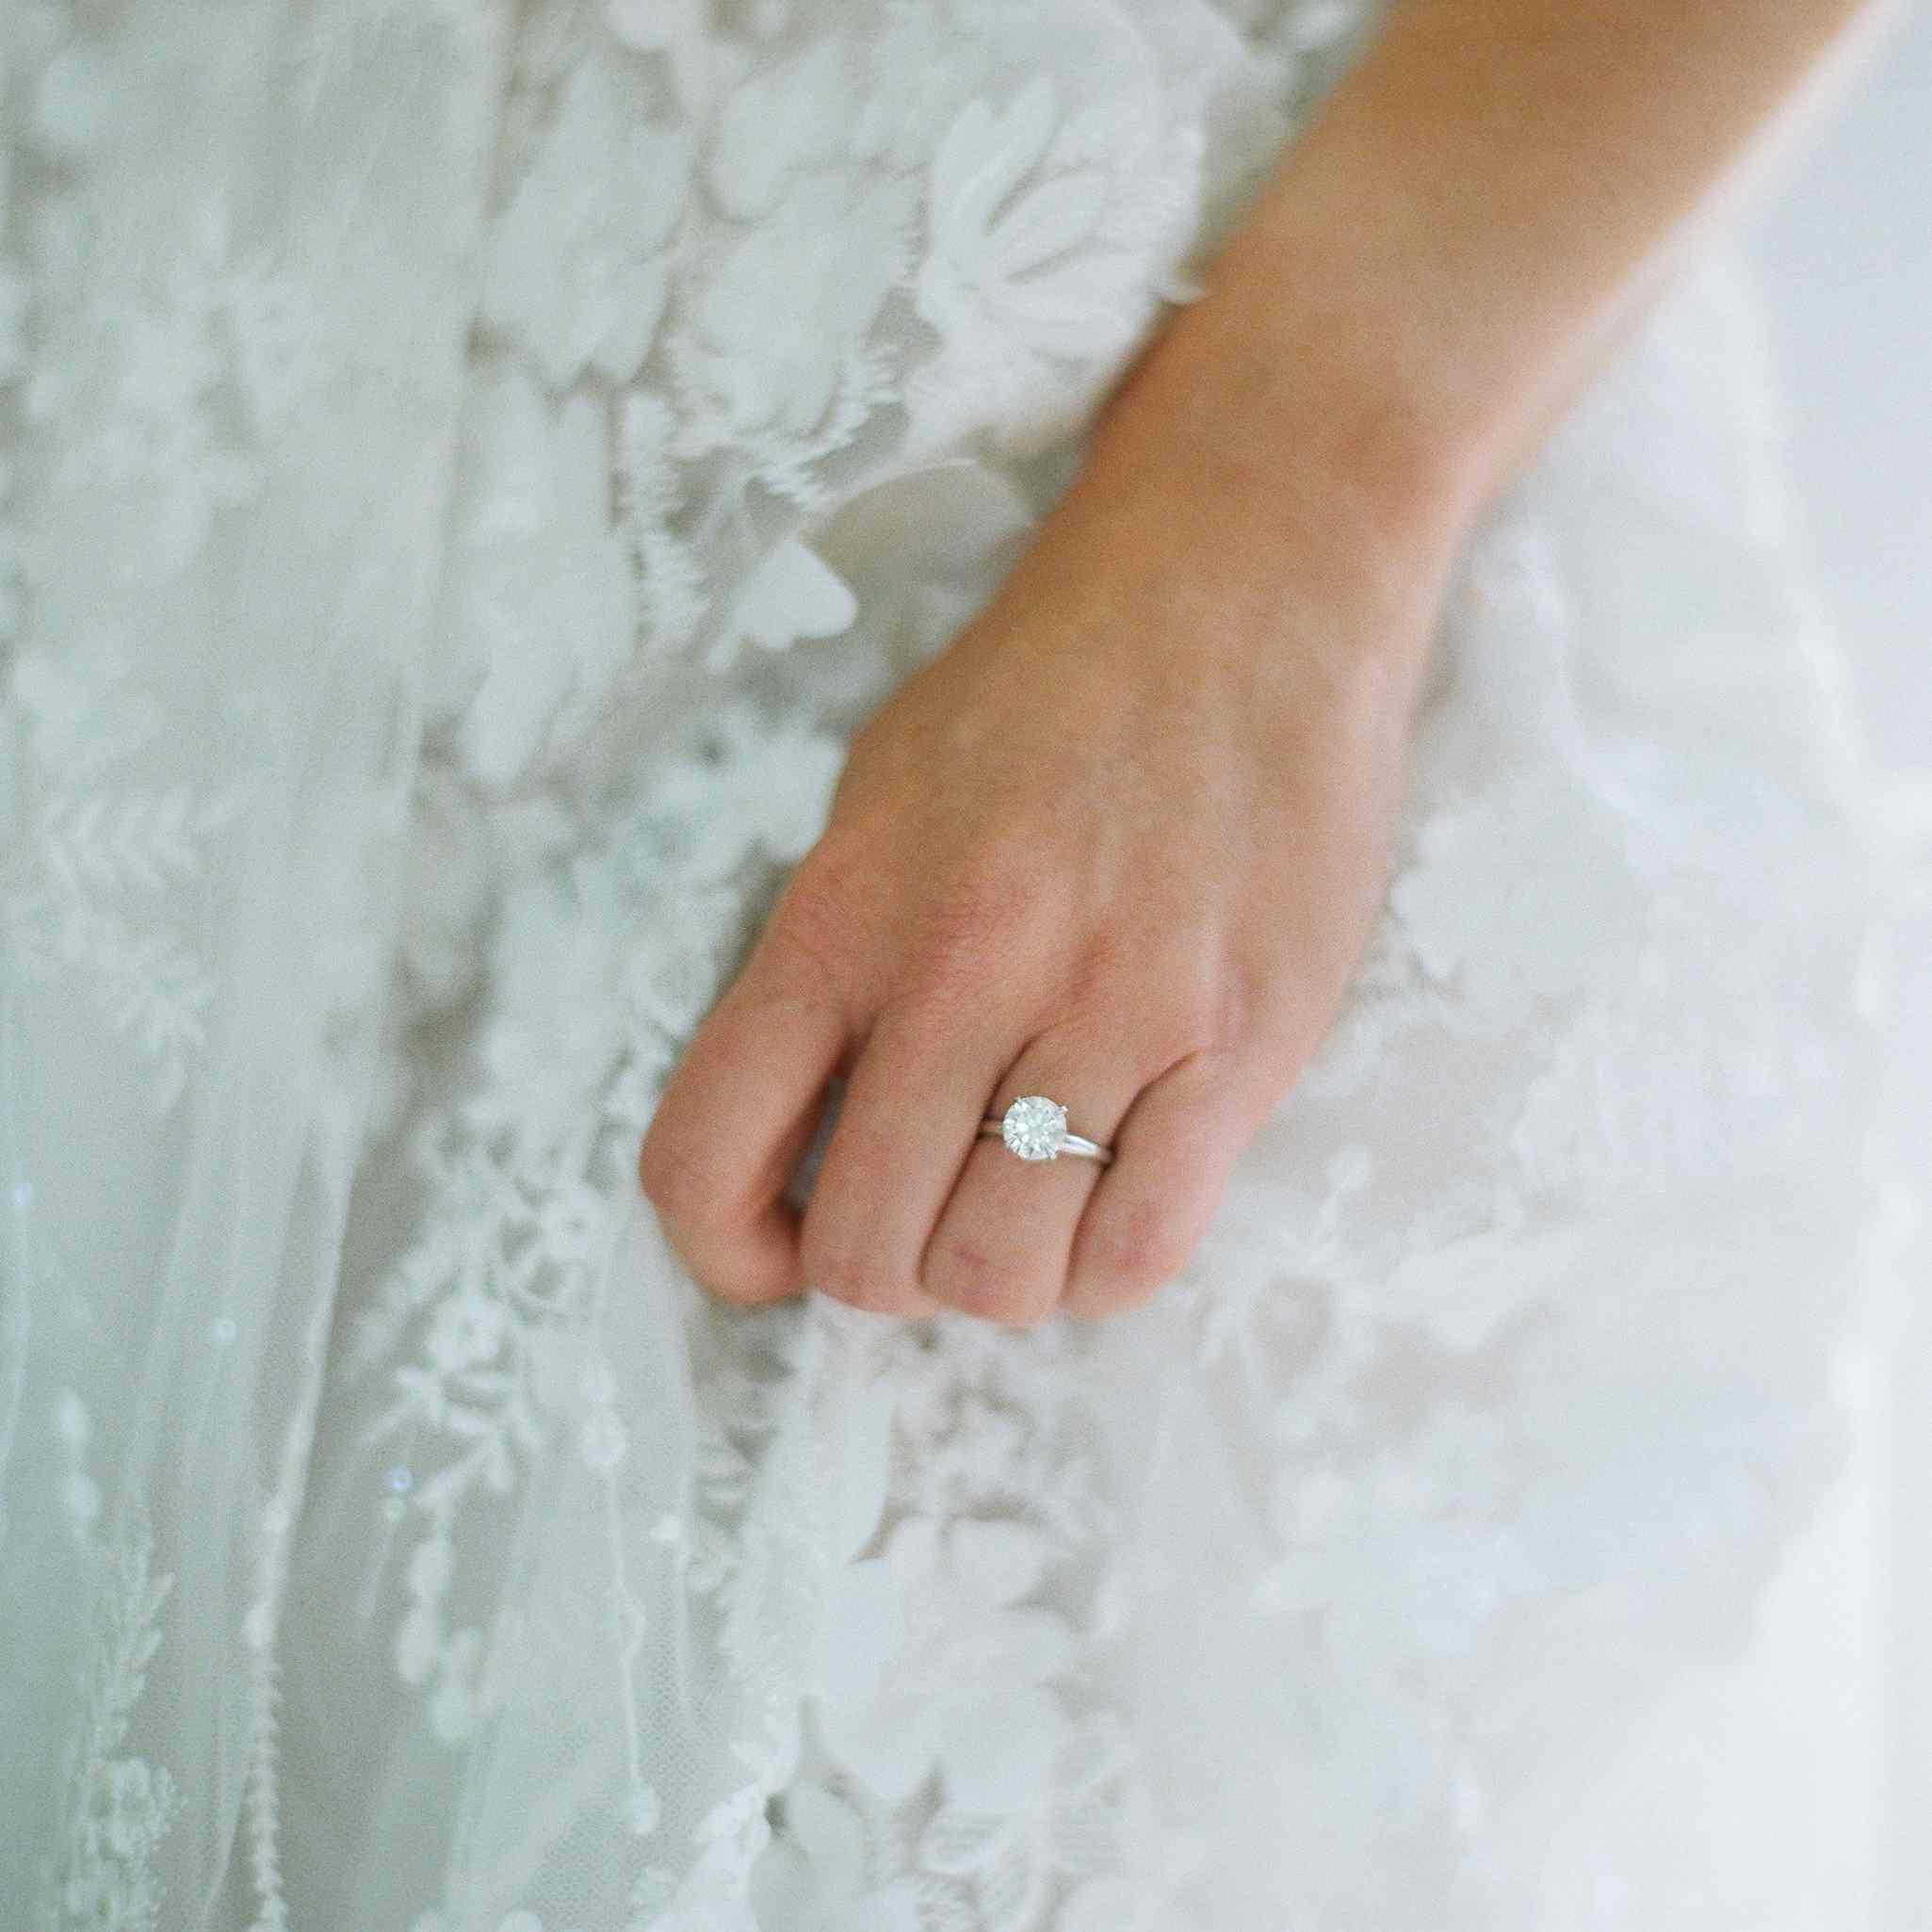 Bride wearing round-cut engagement ring